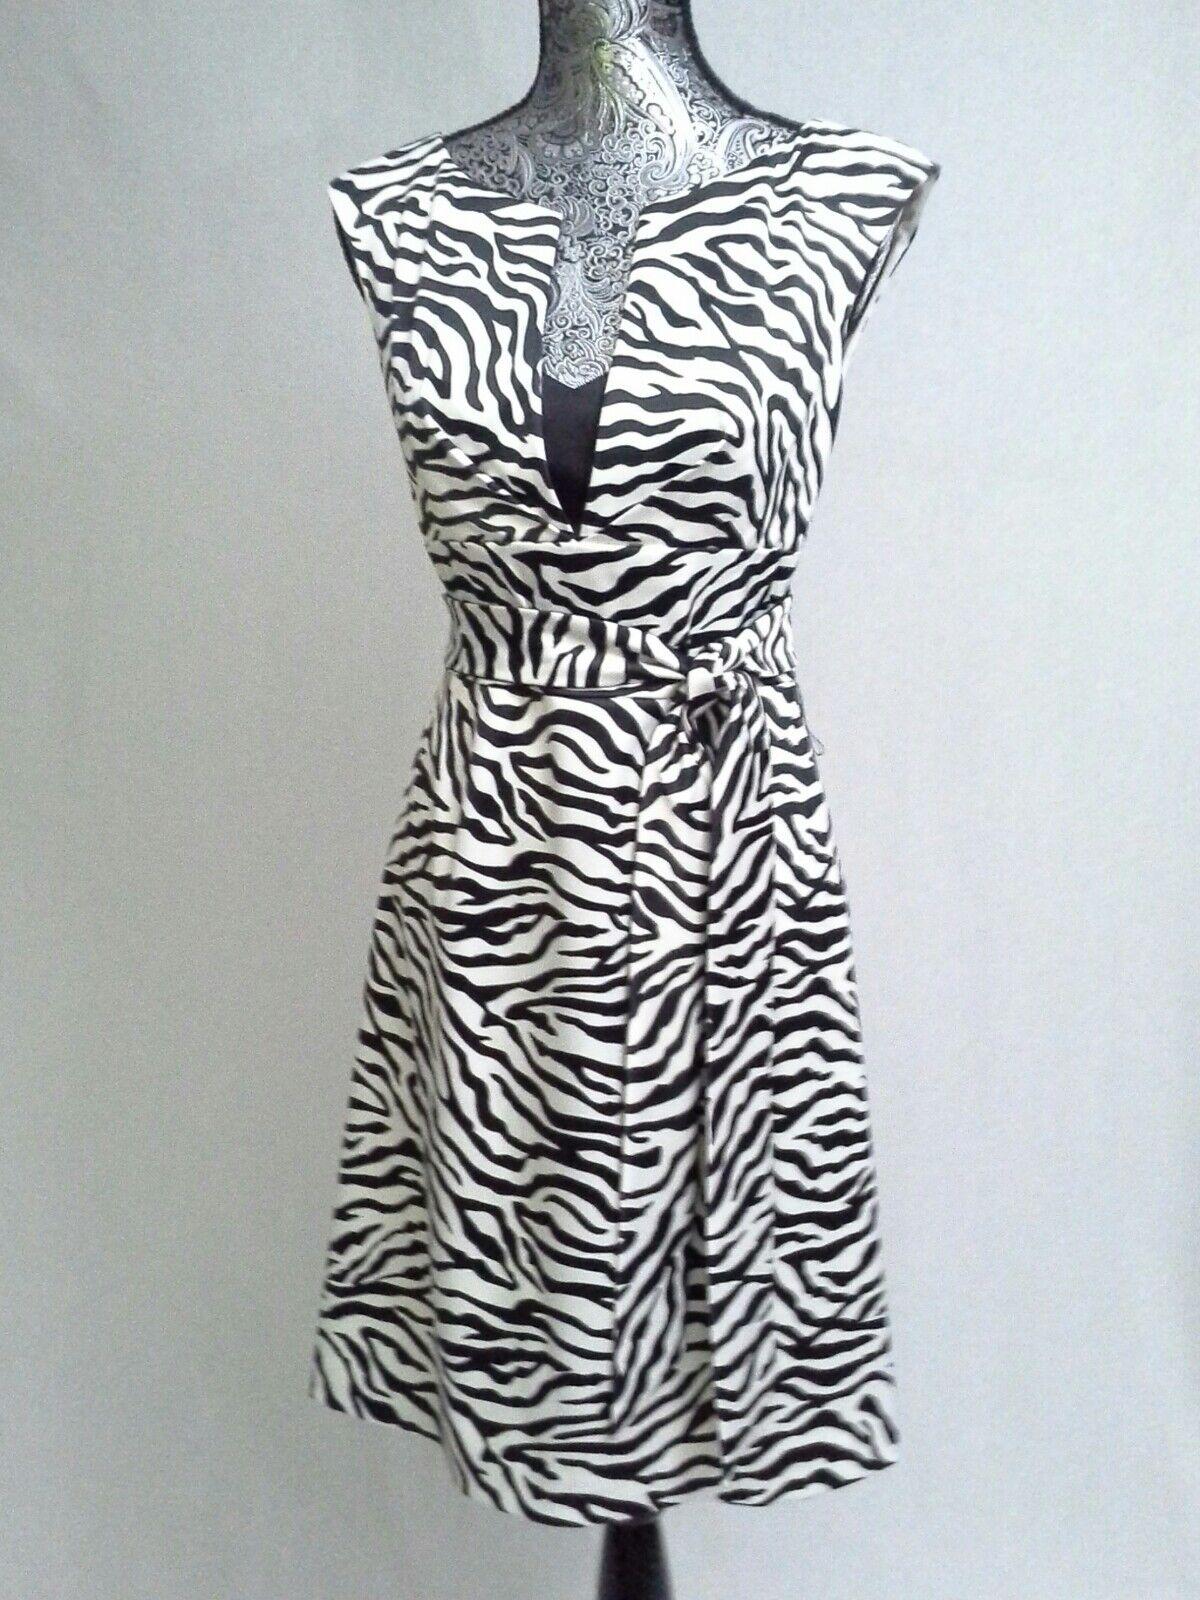 Weiß House schwarz Market Dress Zebra Print Satin Größe 4